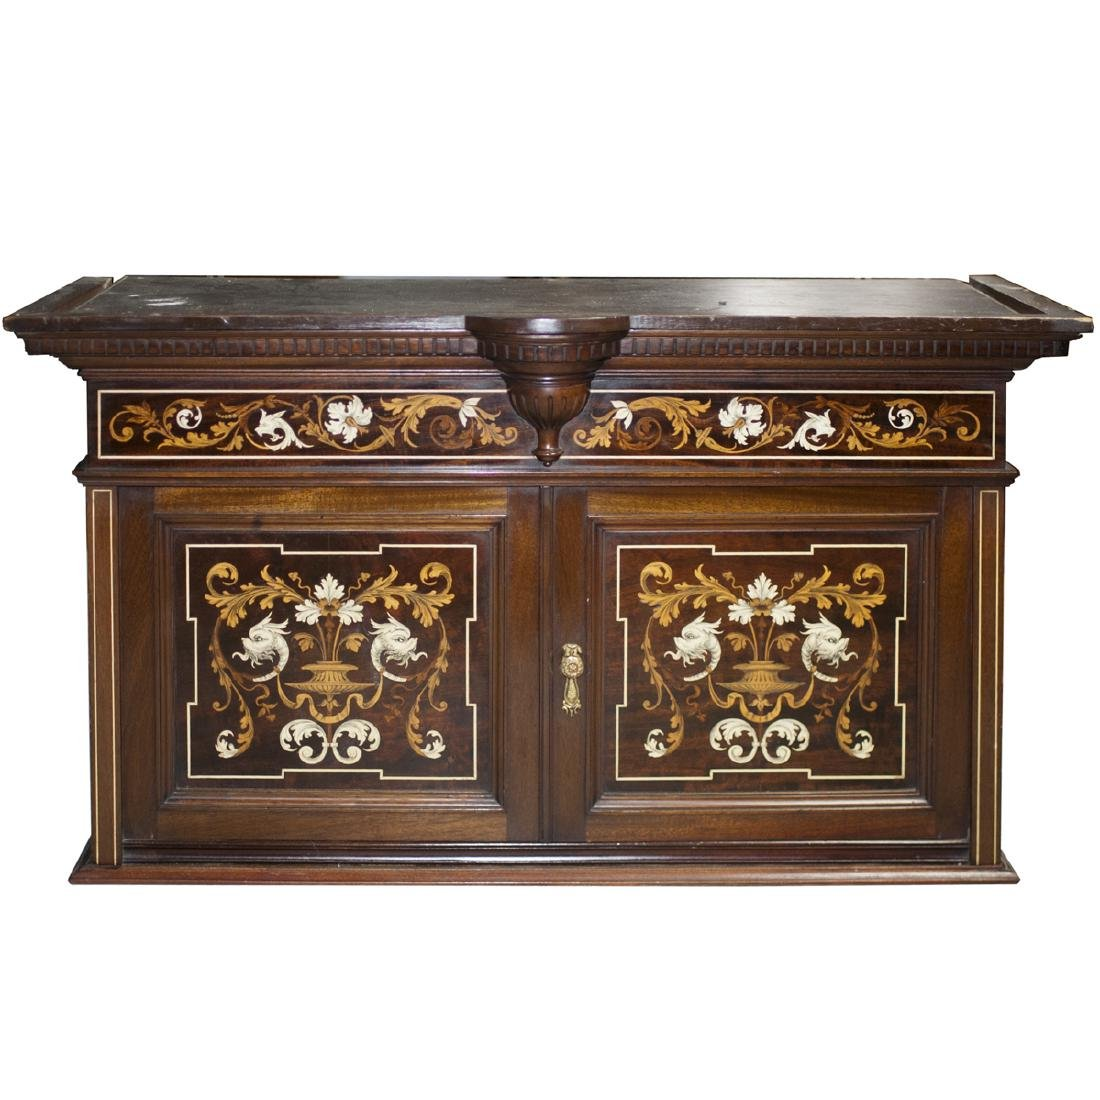 Antique Italian Marquetry Inlaid Cabinet